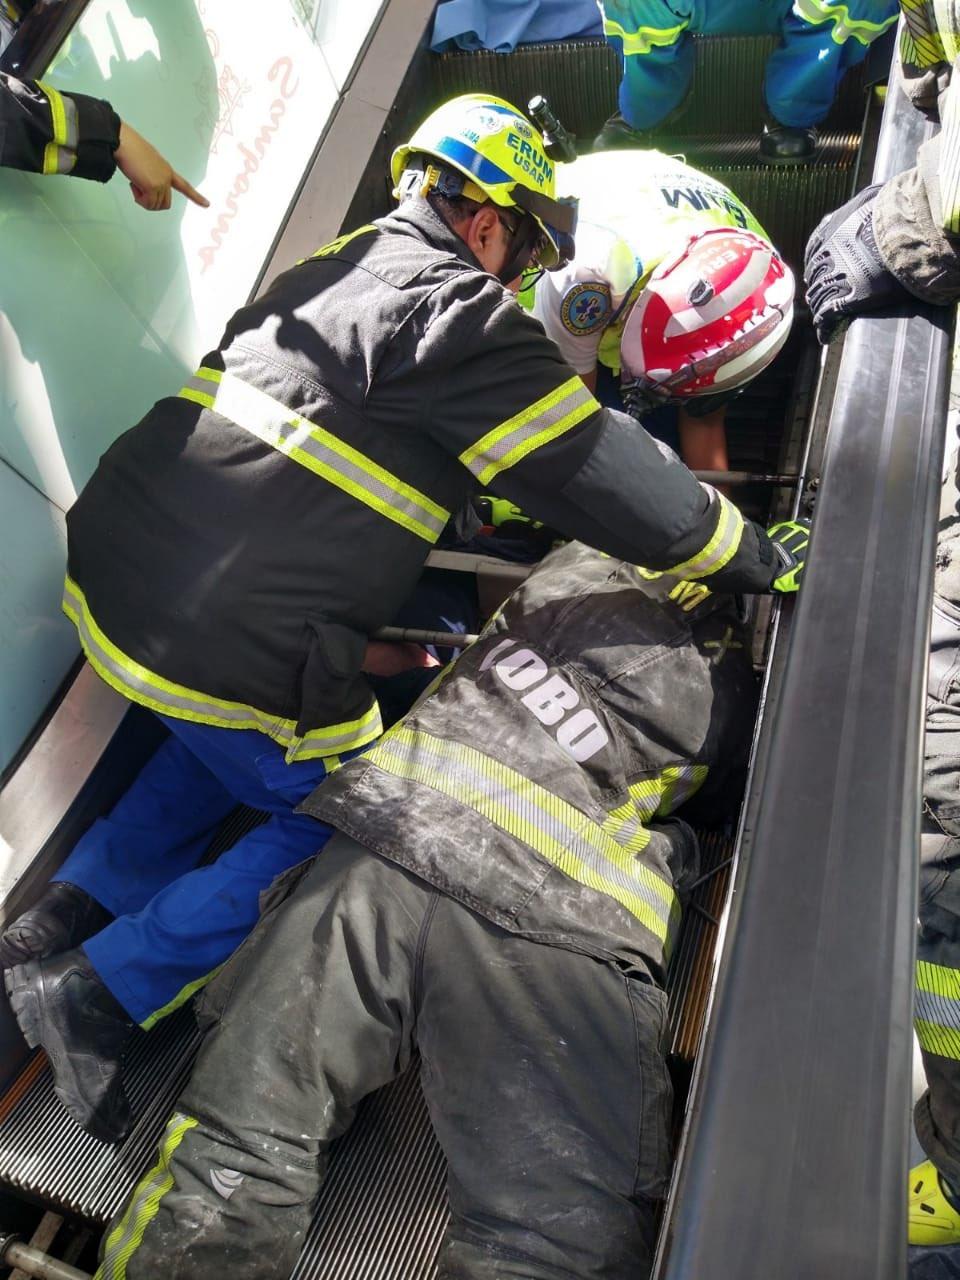 HOMBRE FALLECE EN ESCALERAS ELÉCTRICAS DE CENTRO INSURGENTES